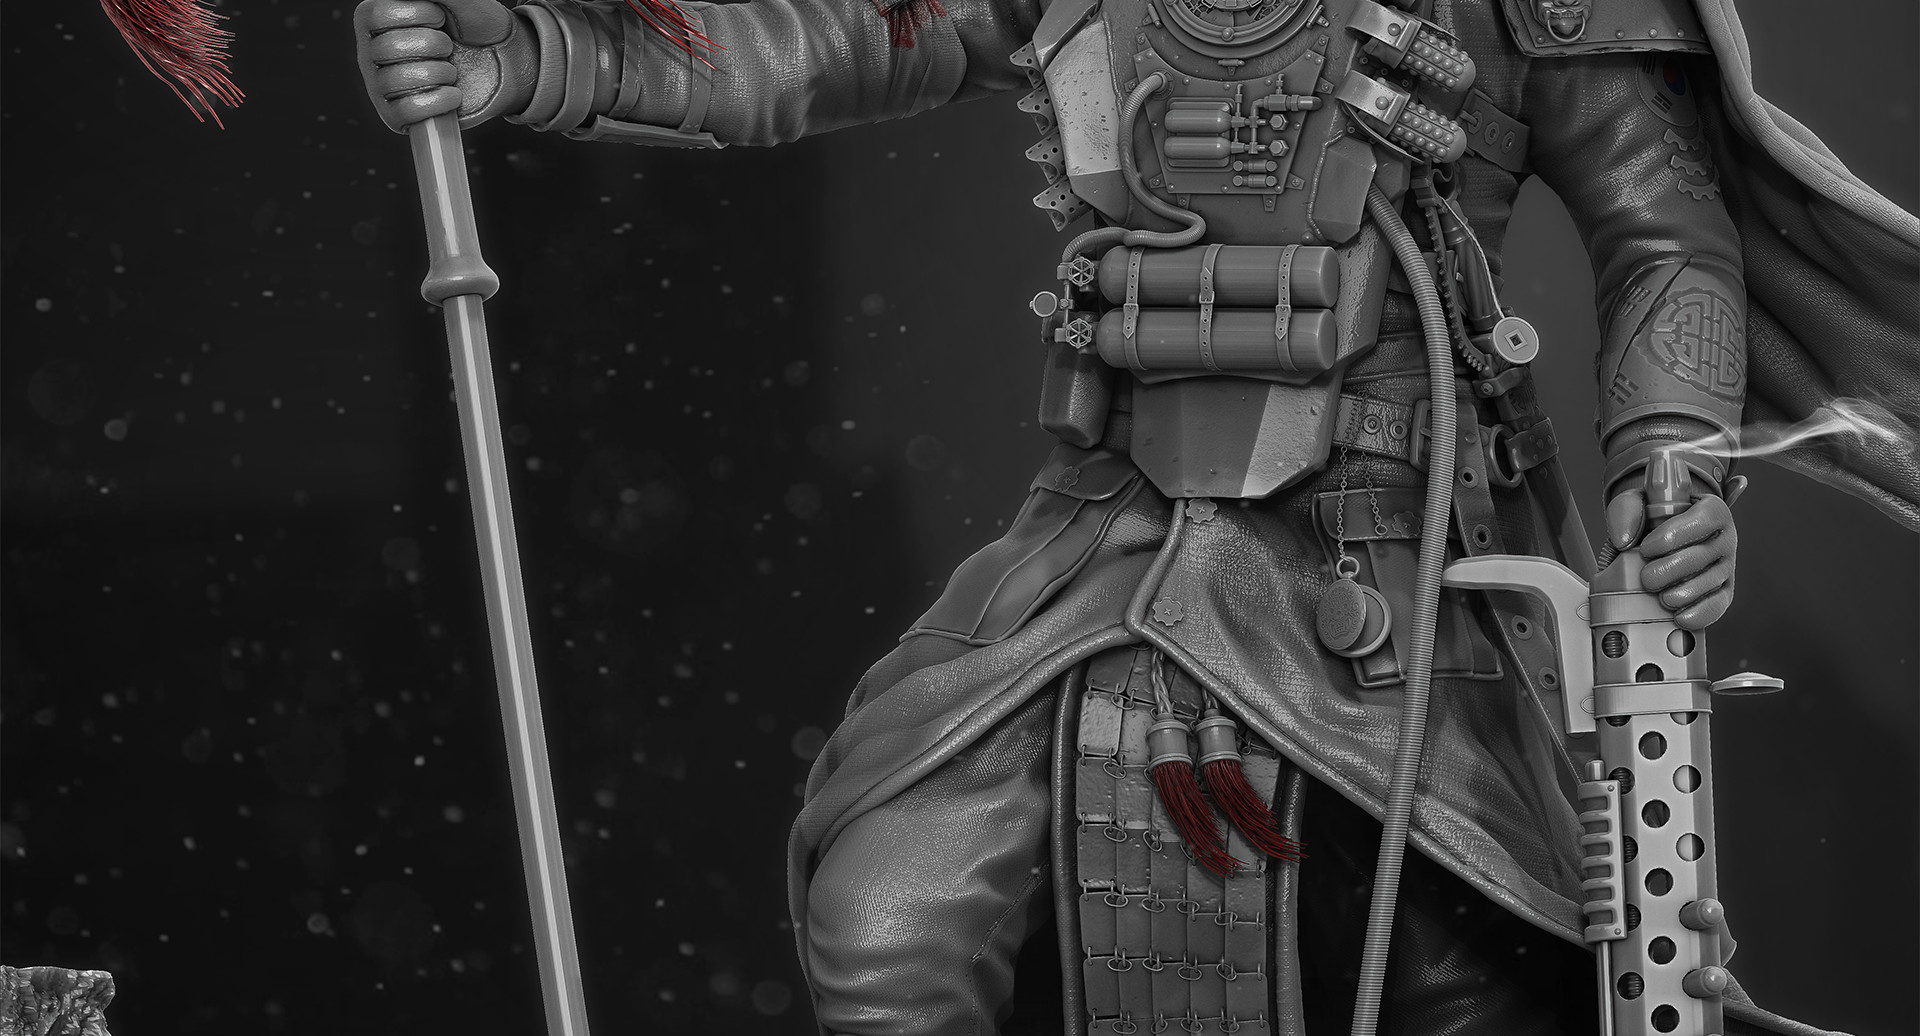 jordan hey korean steampunk warrior